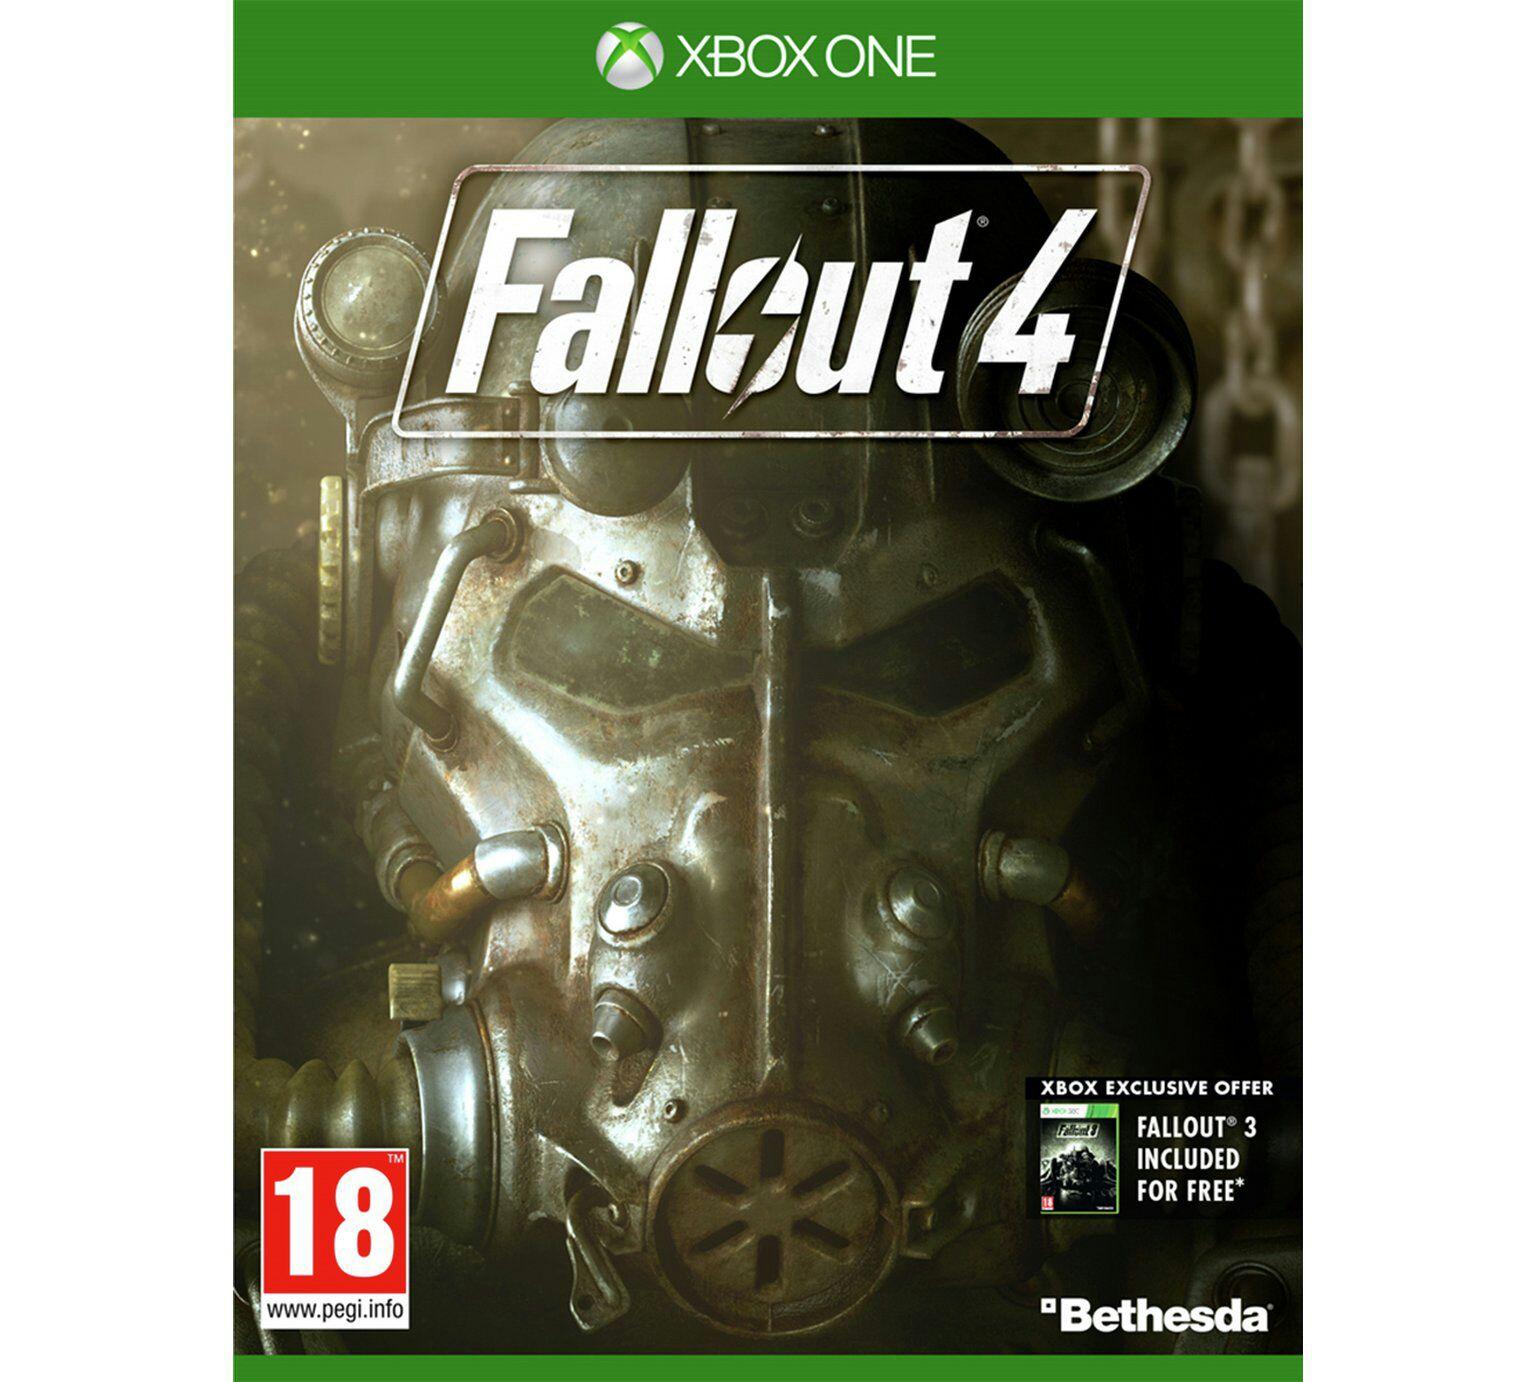 Fallout 4 Xbox One £9.49 @ Argos / £9.12 @ Gameseek